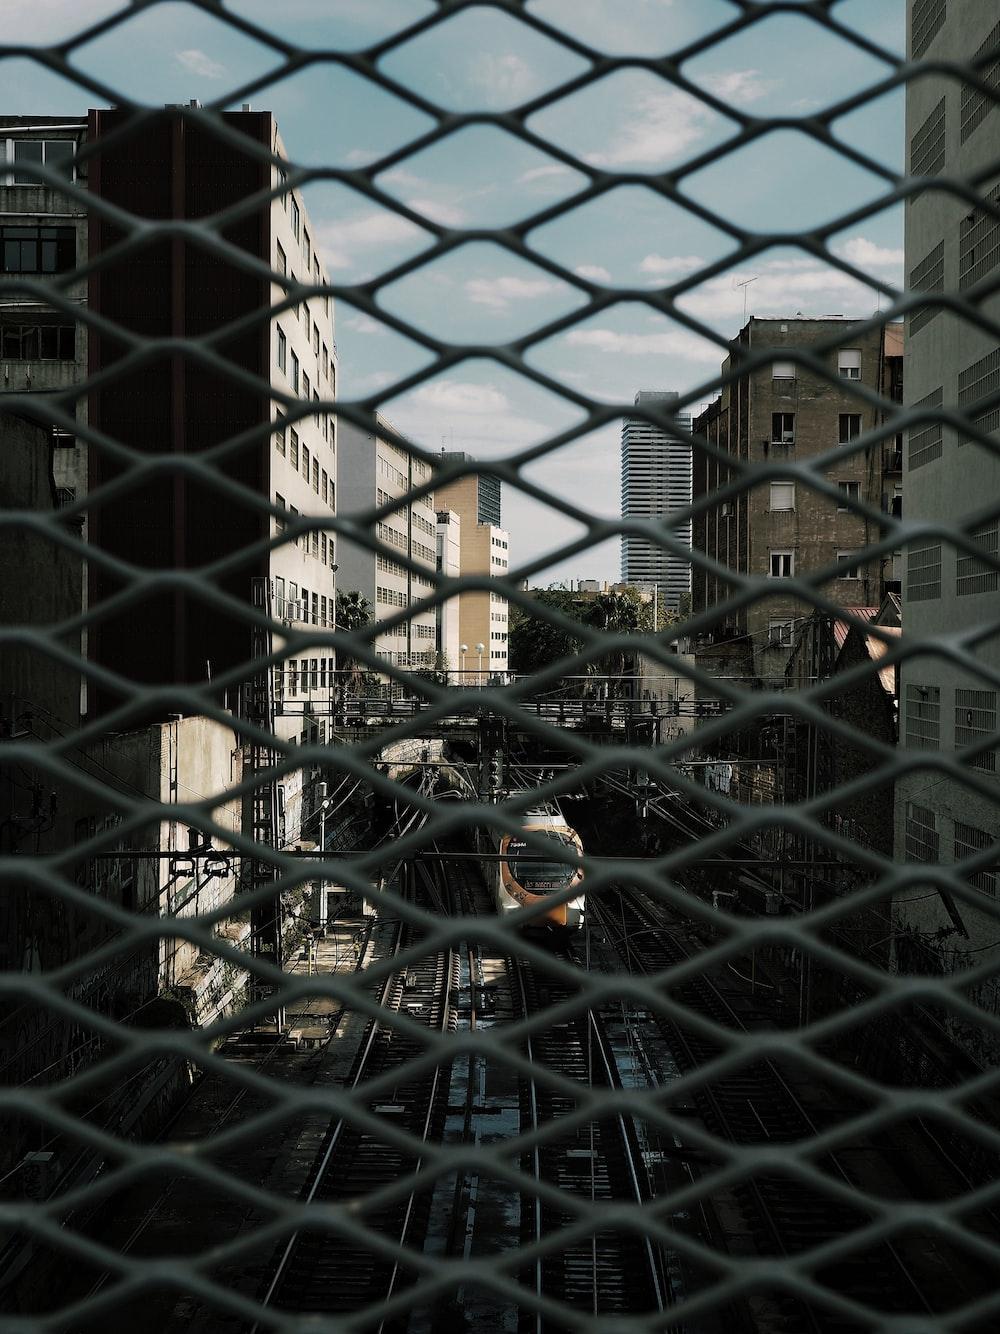 black metal mesh fence near brown concrete building during daytime